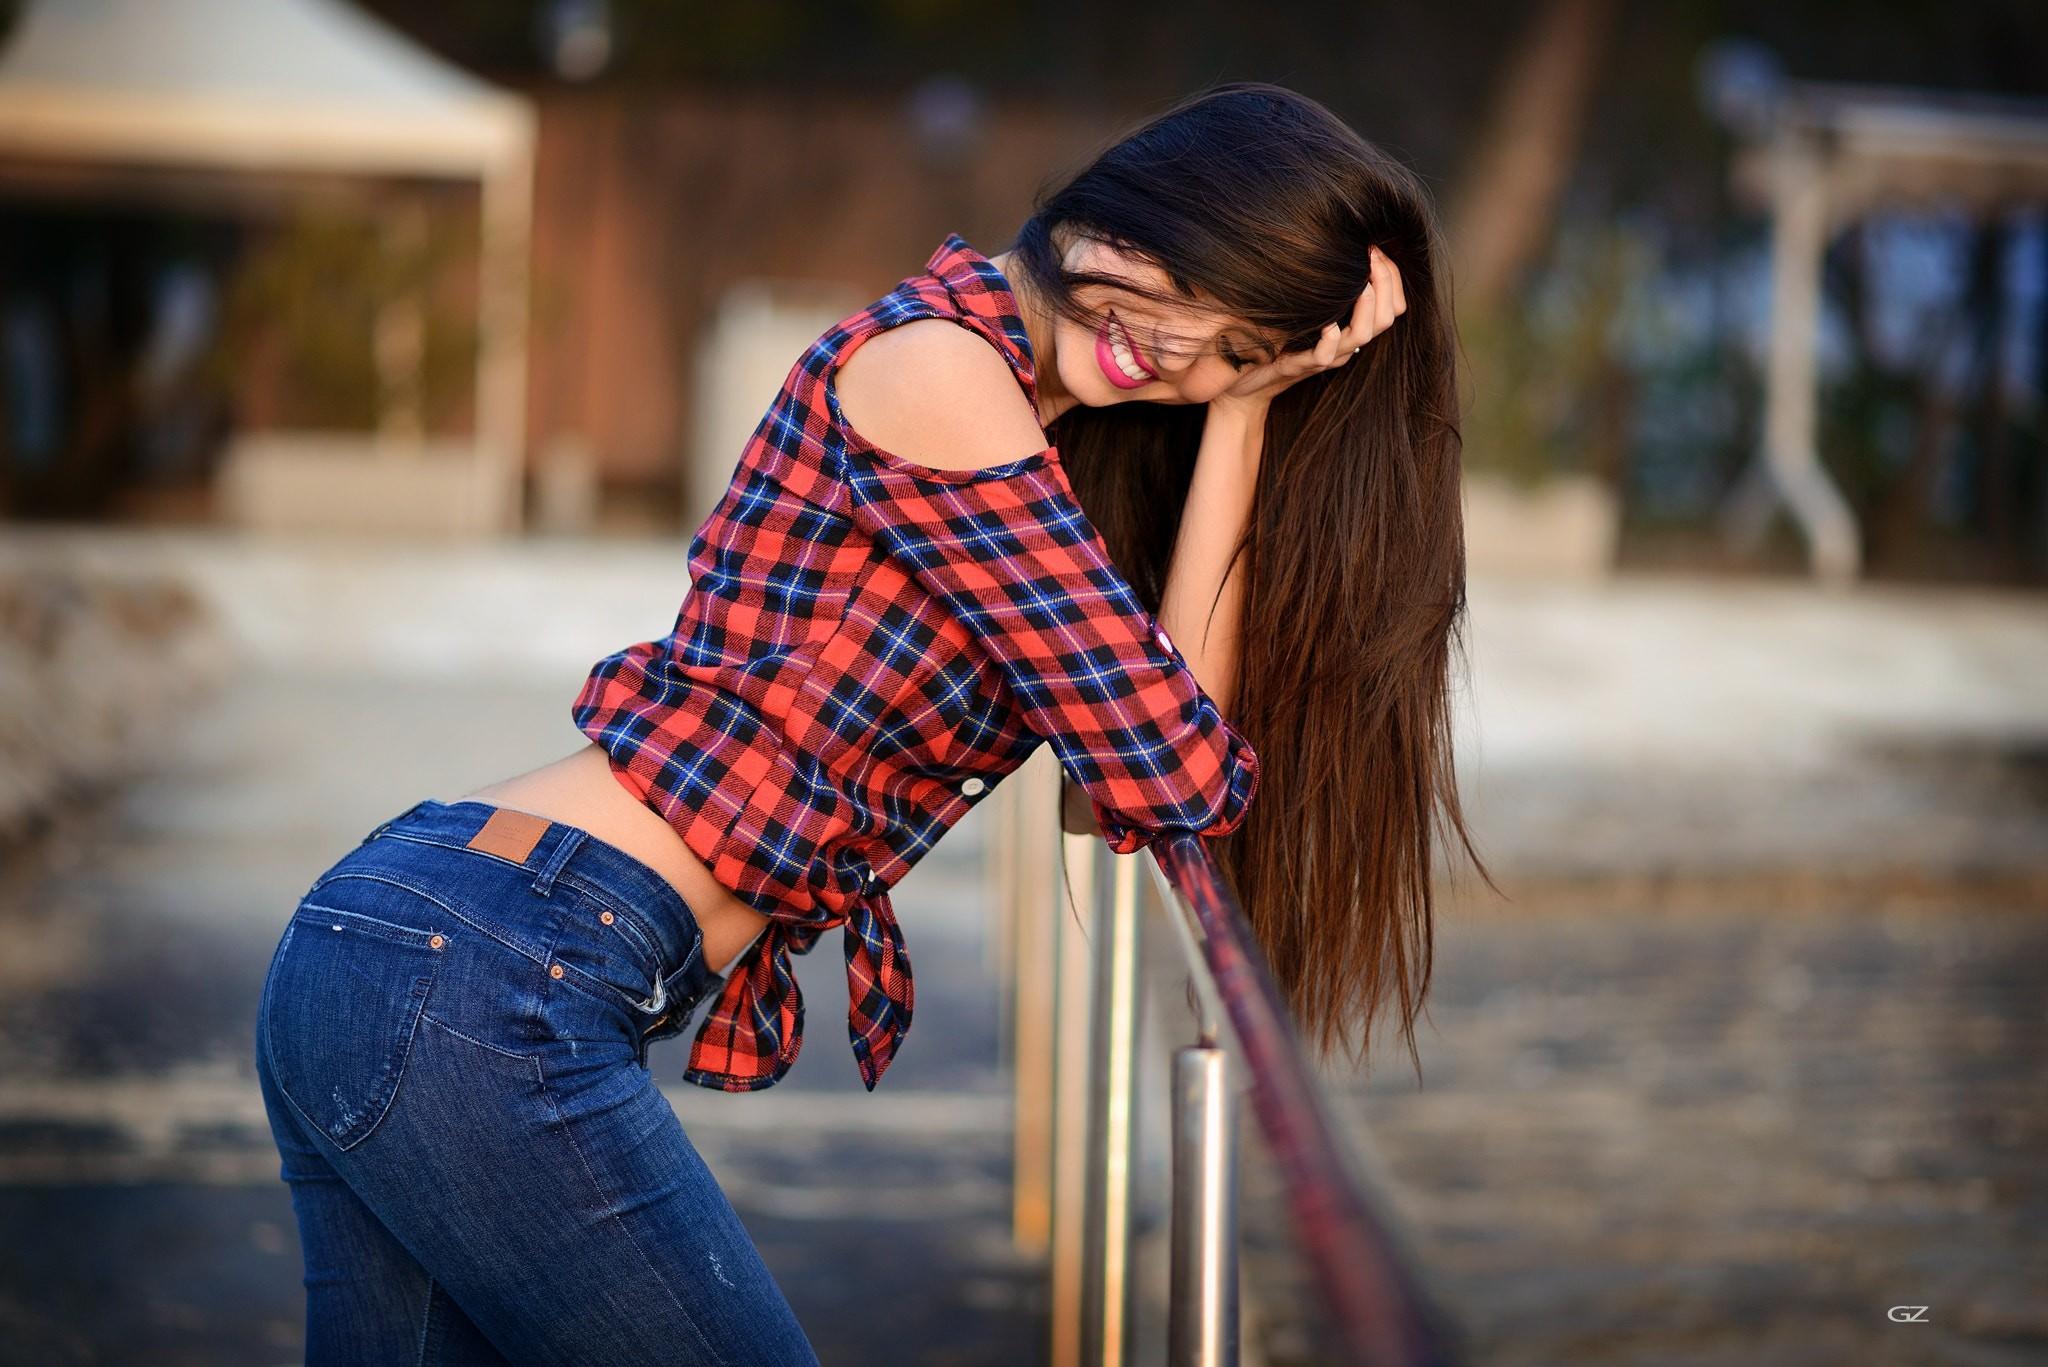 People 2048x1367 women Giovanni Zacche pants jeans shirt depth of field